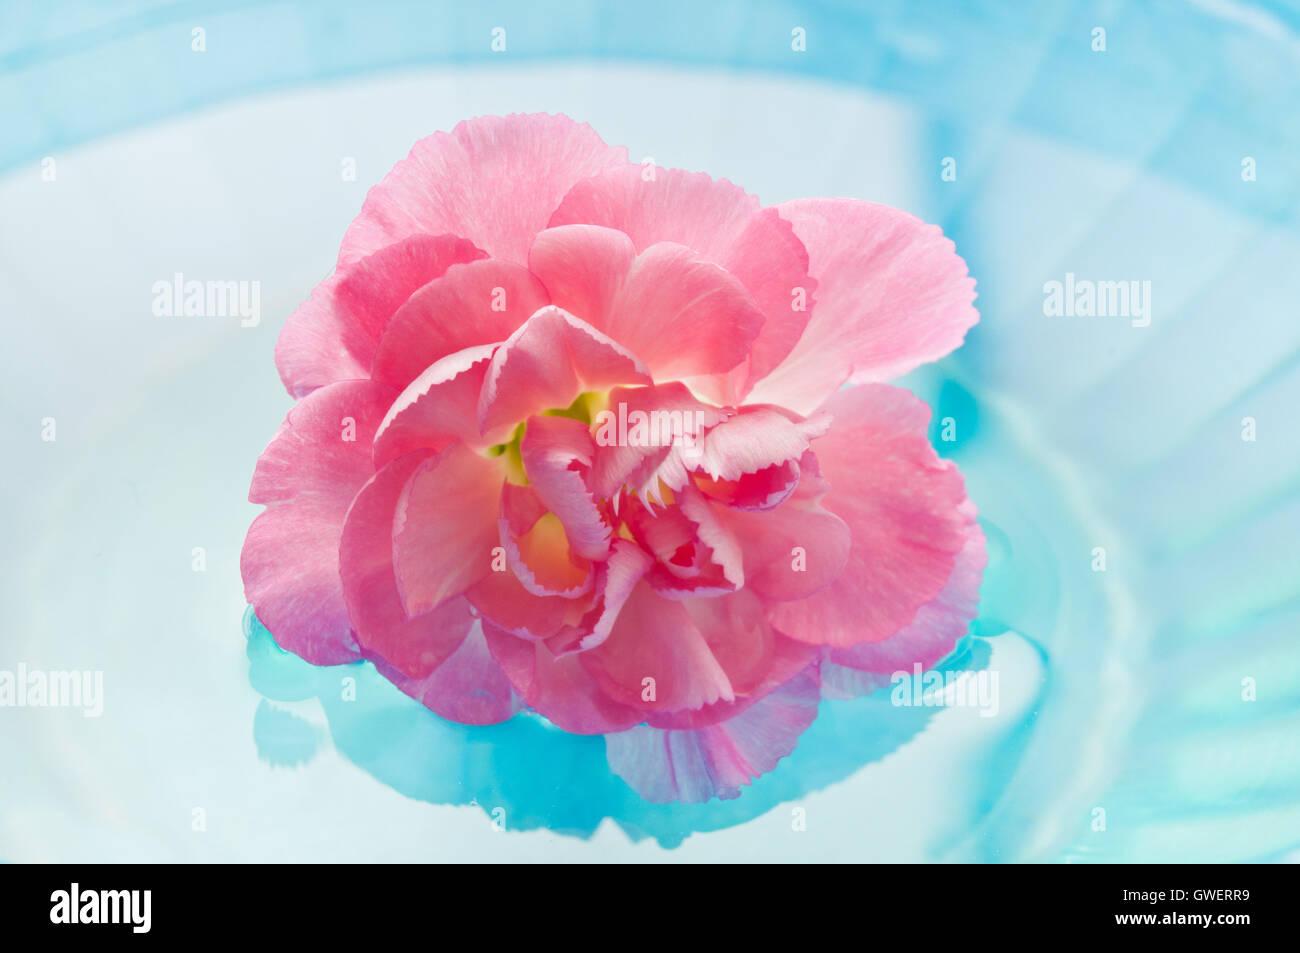 rosa Nelke Blume im Wasser, Meditation und Achtsamkeit Stockbild